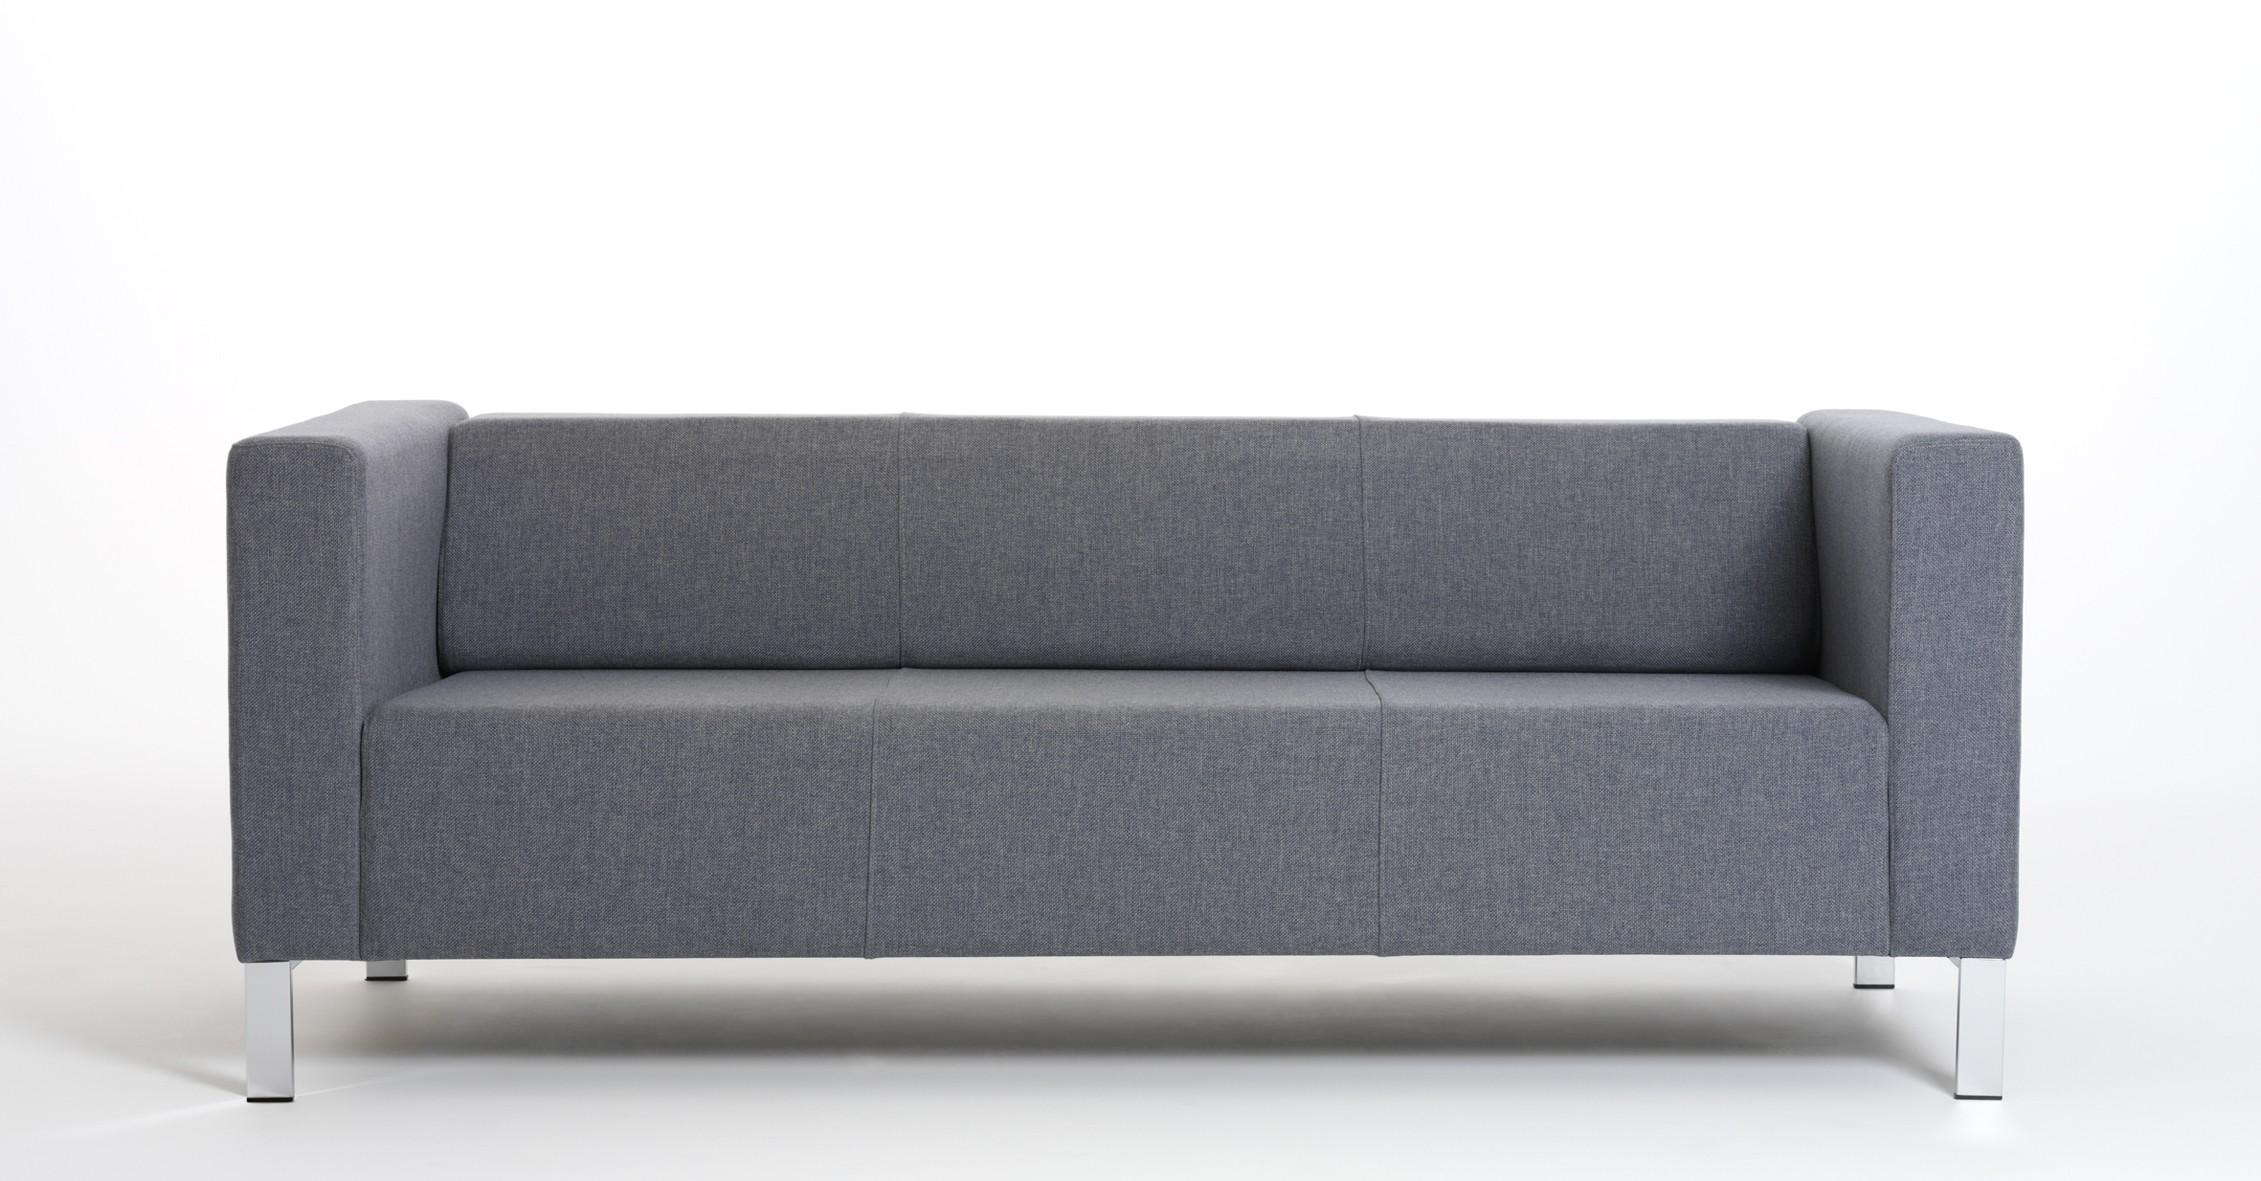 canap 3 places kube achat fauteuils d 39 accueil canap s chaises salle d 39 attente 688 00. Black Bedroom Furniture Sets. Home Design Ideas